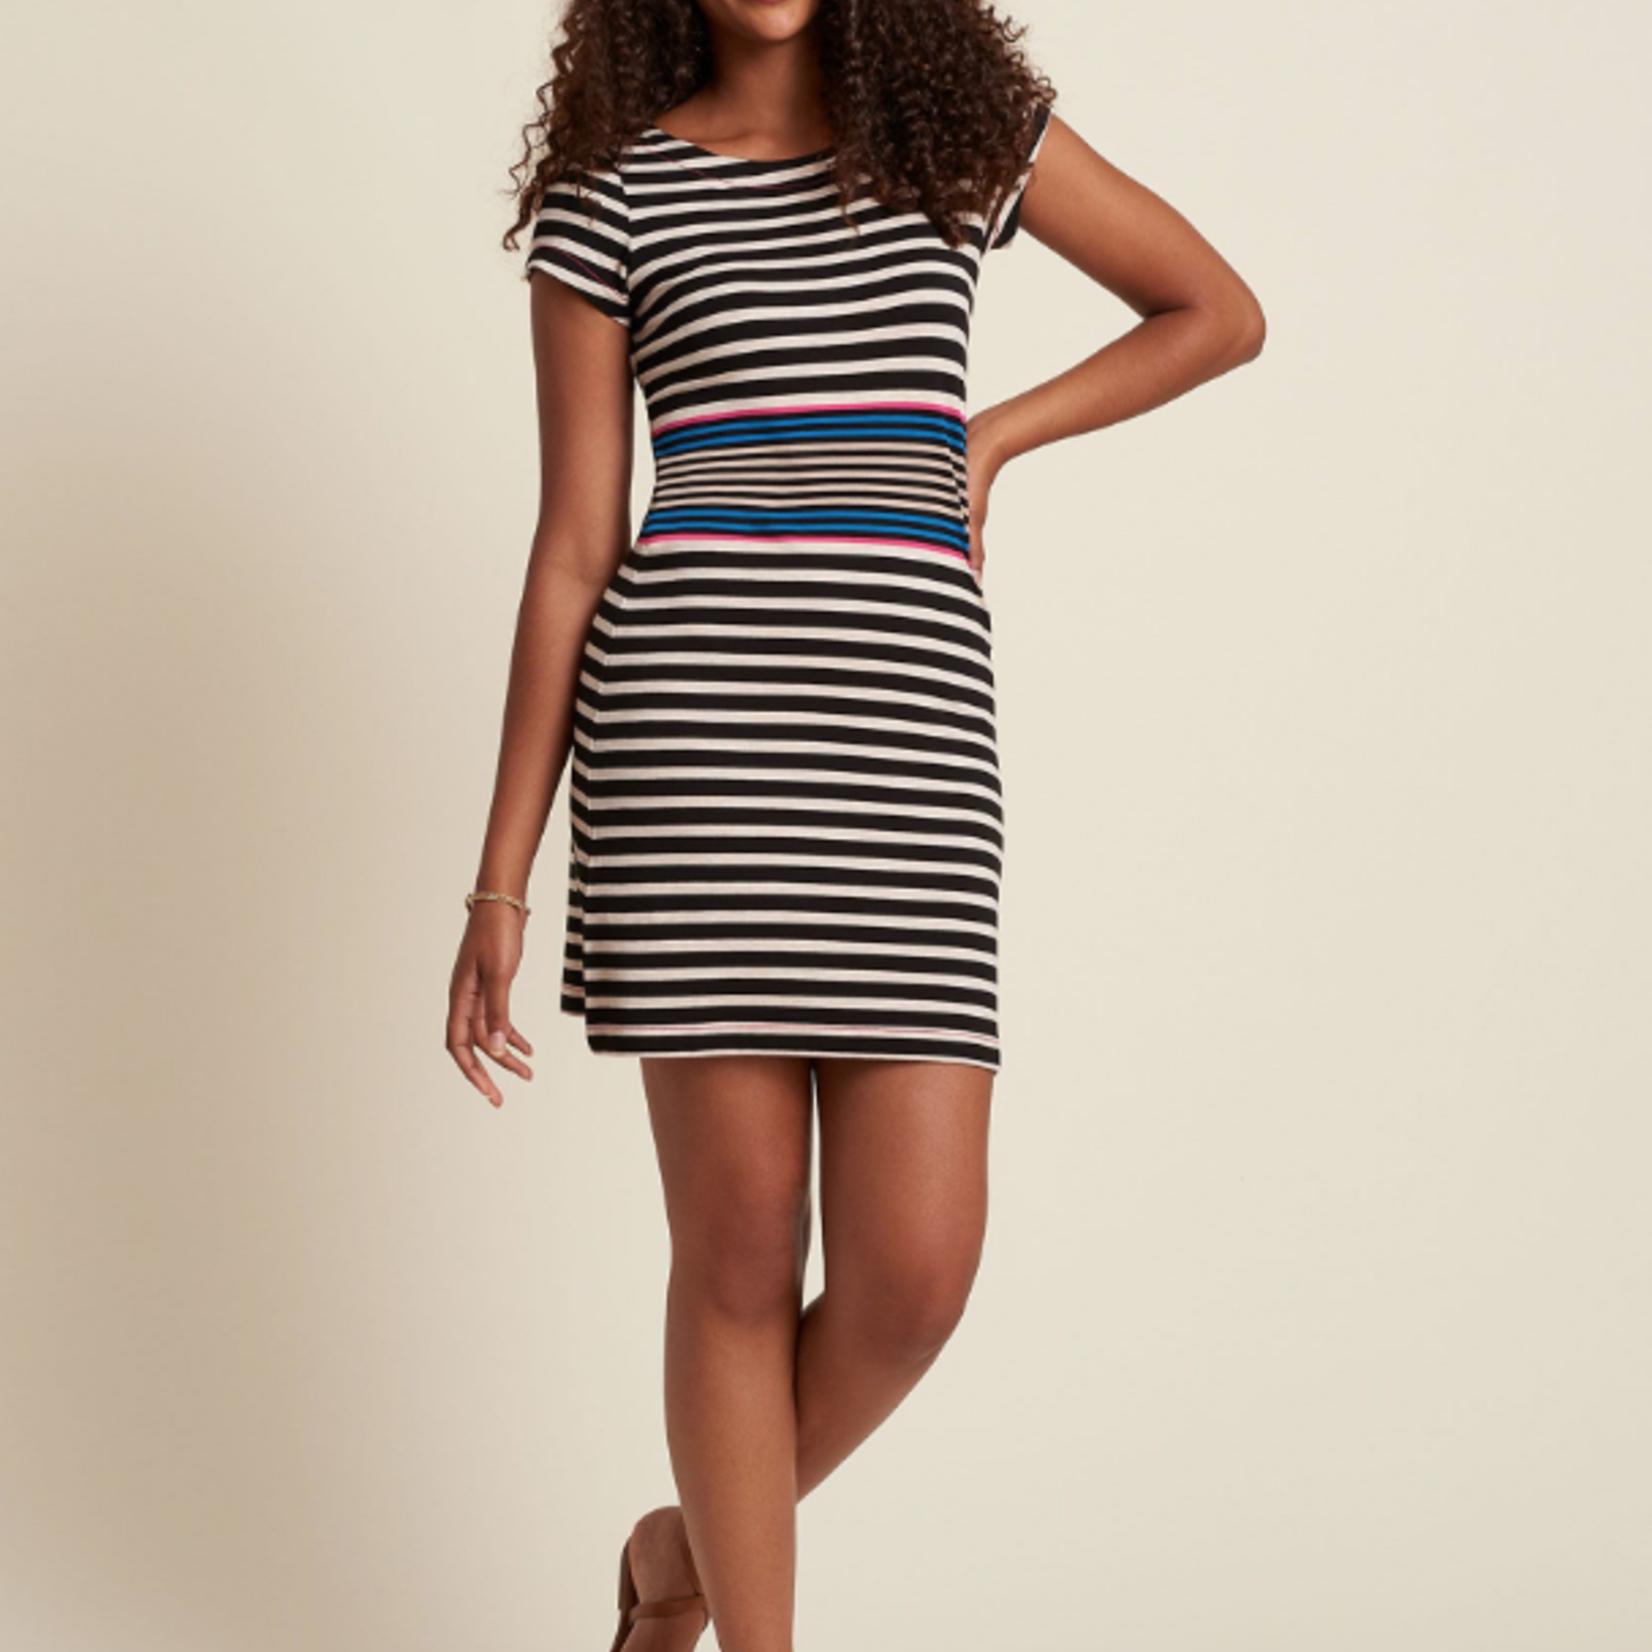 Hatley Hatley Nellie Dress - P-136104